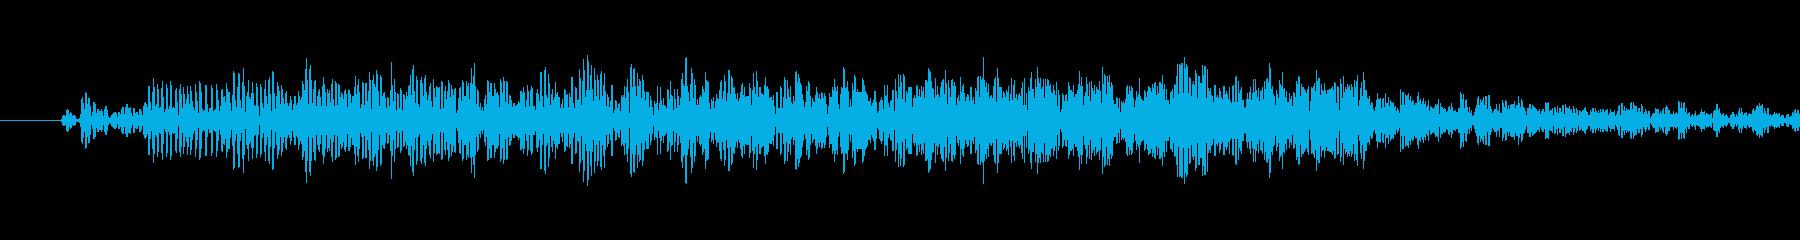 SciFi EC01_84_3の再生済みの波形